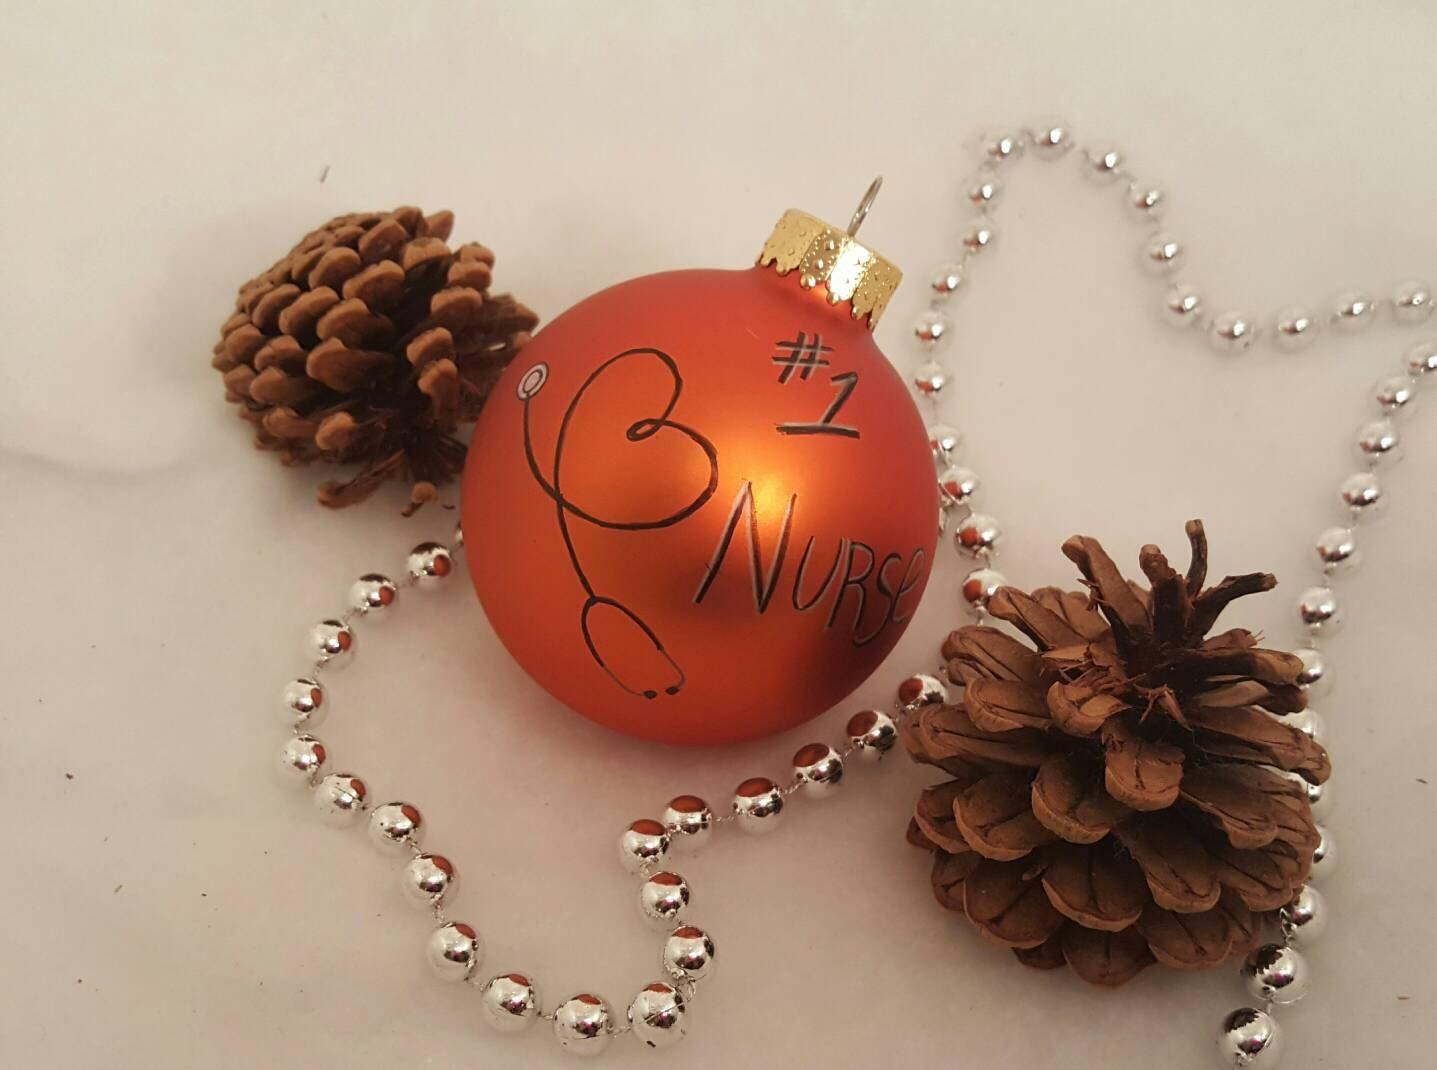 Number 1 Nurse Personalized Ornament SET Nurse Gifts Nurse | Etsy